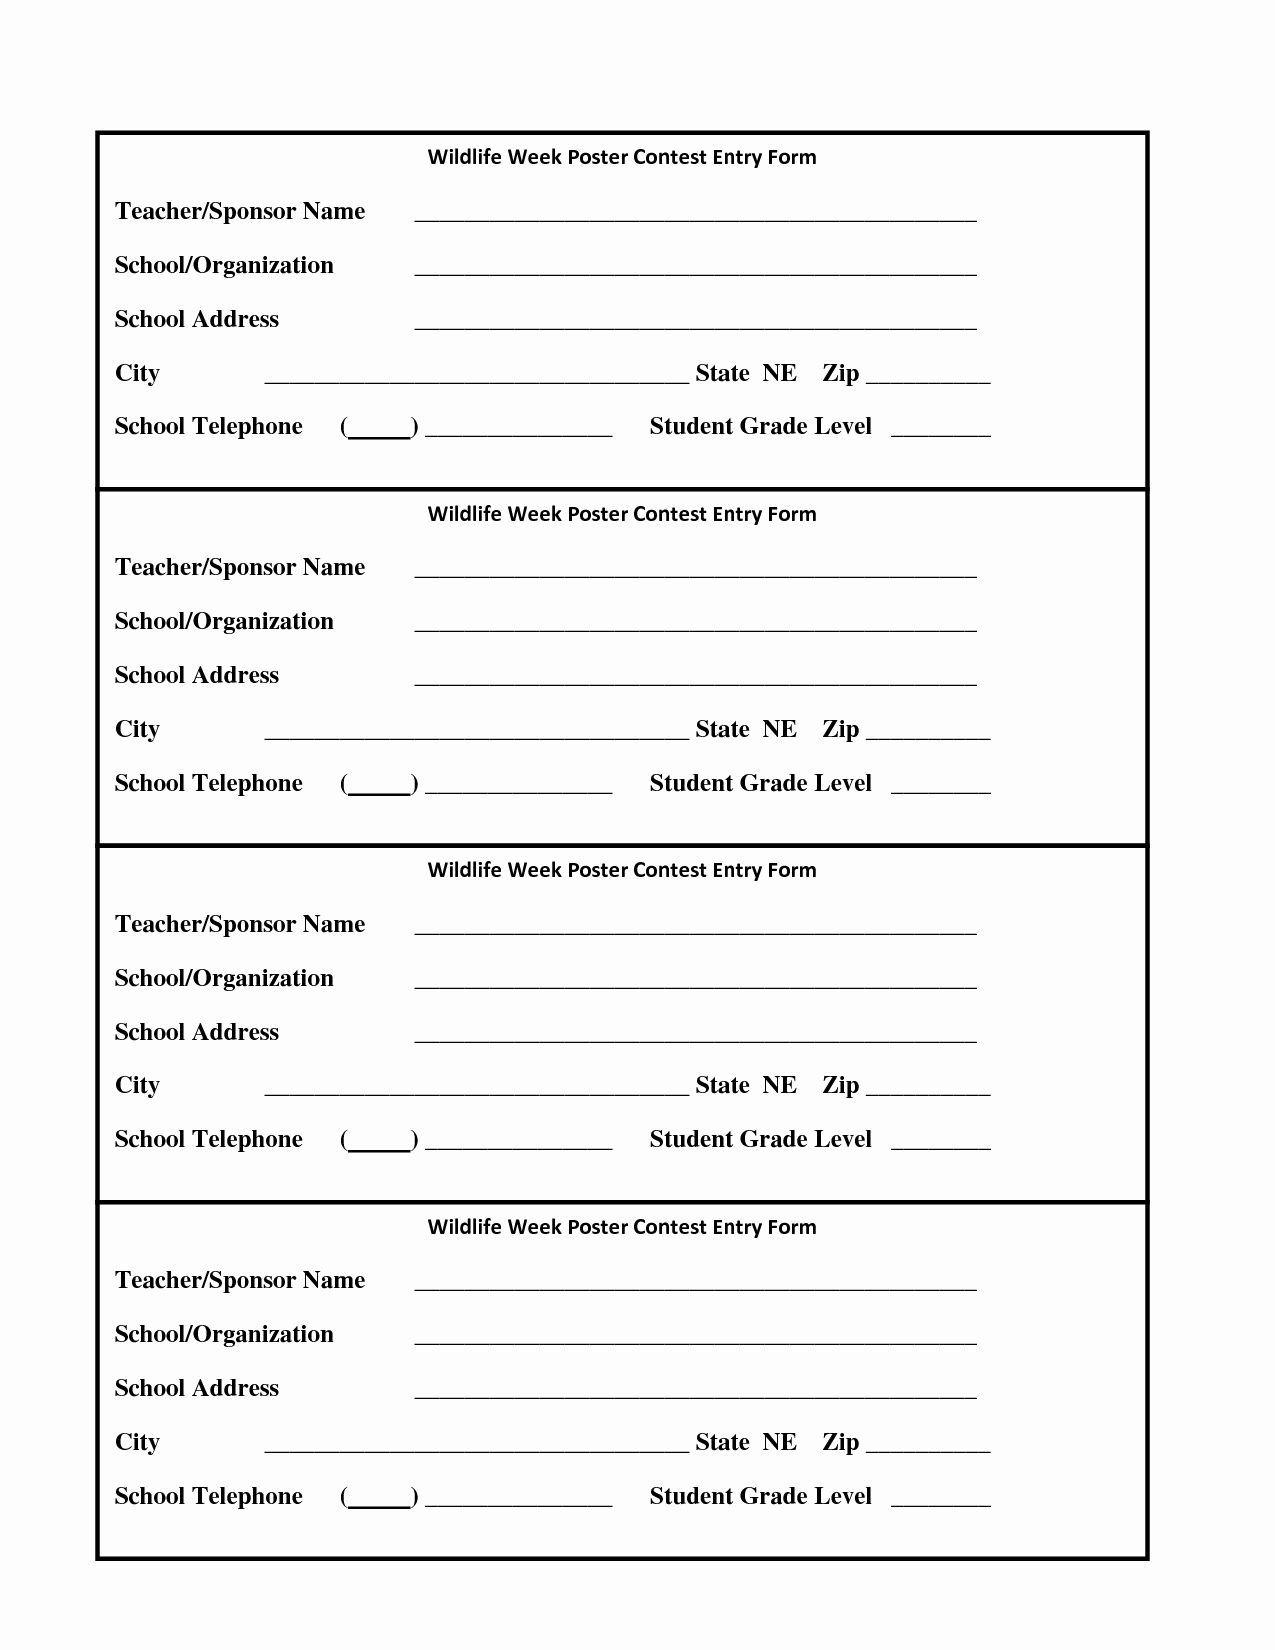 009 Incredible Entry Form Template Word Photo  Raffle Data MicrosoftFull